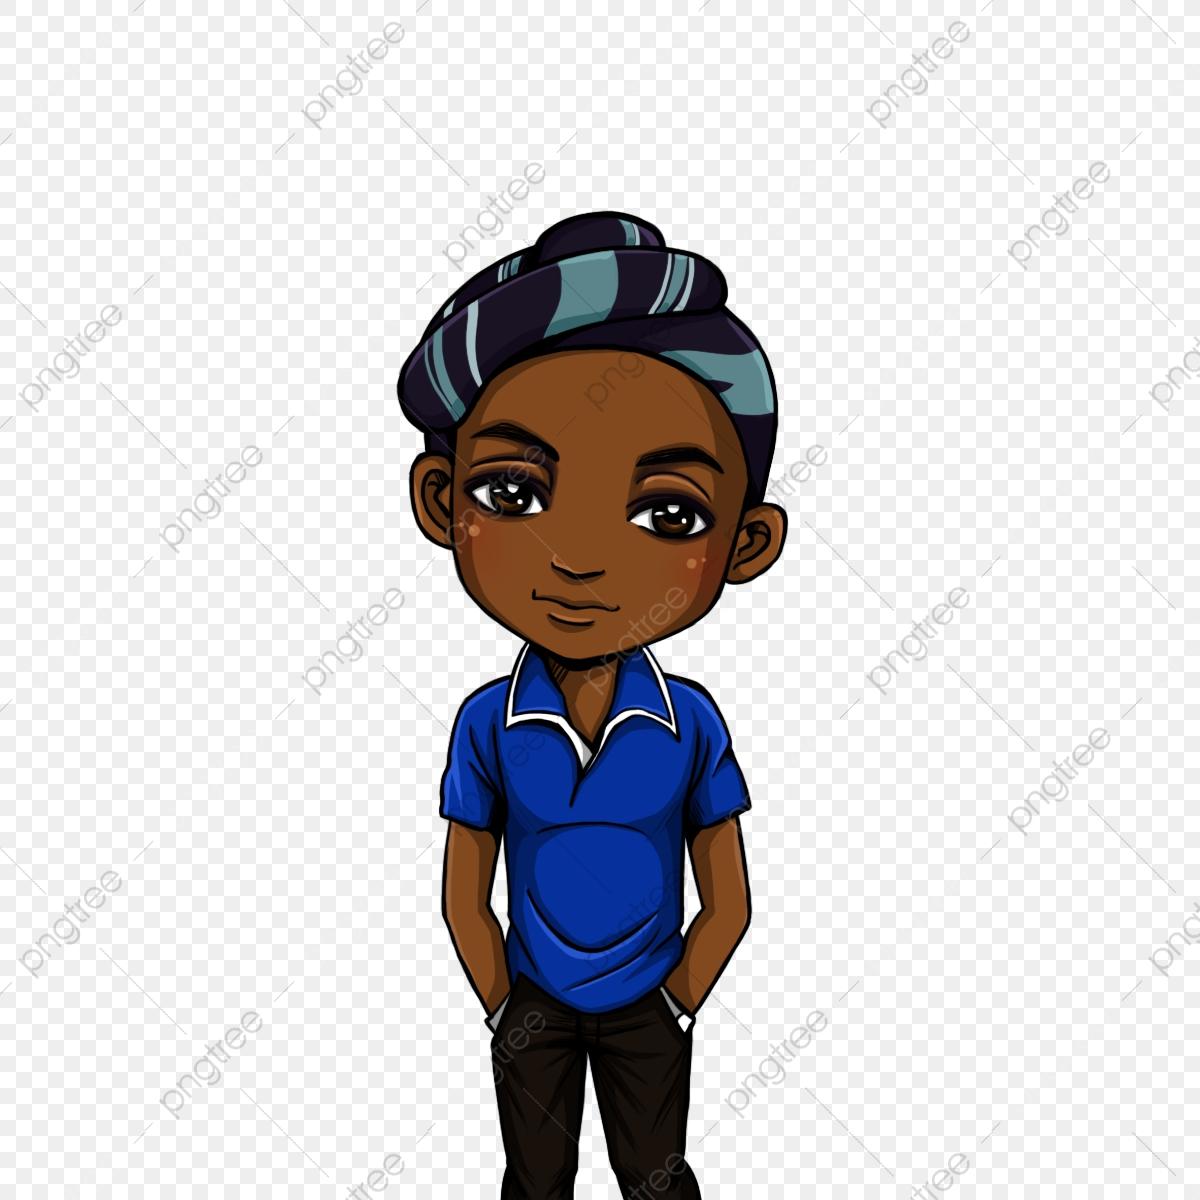 Chibi Black Boy, Chibi, Cartoon, Boy PNG Transparent Clipart Image.